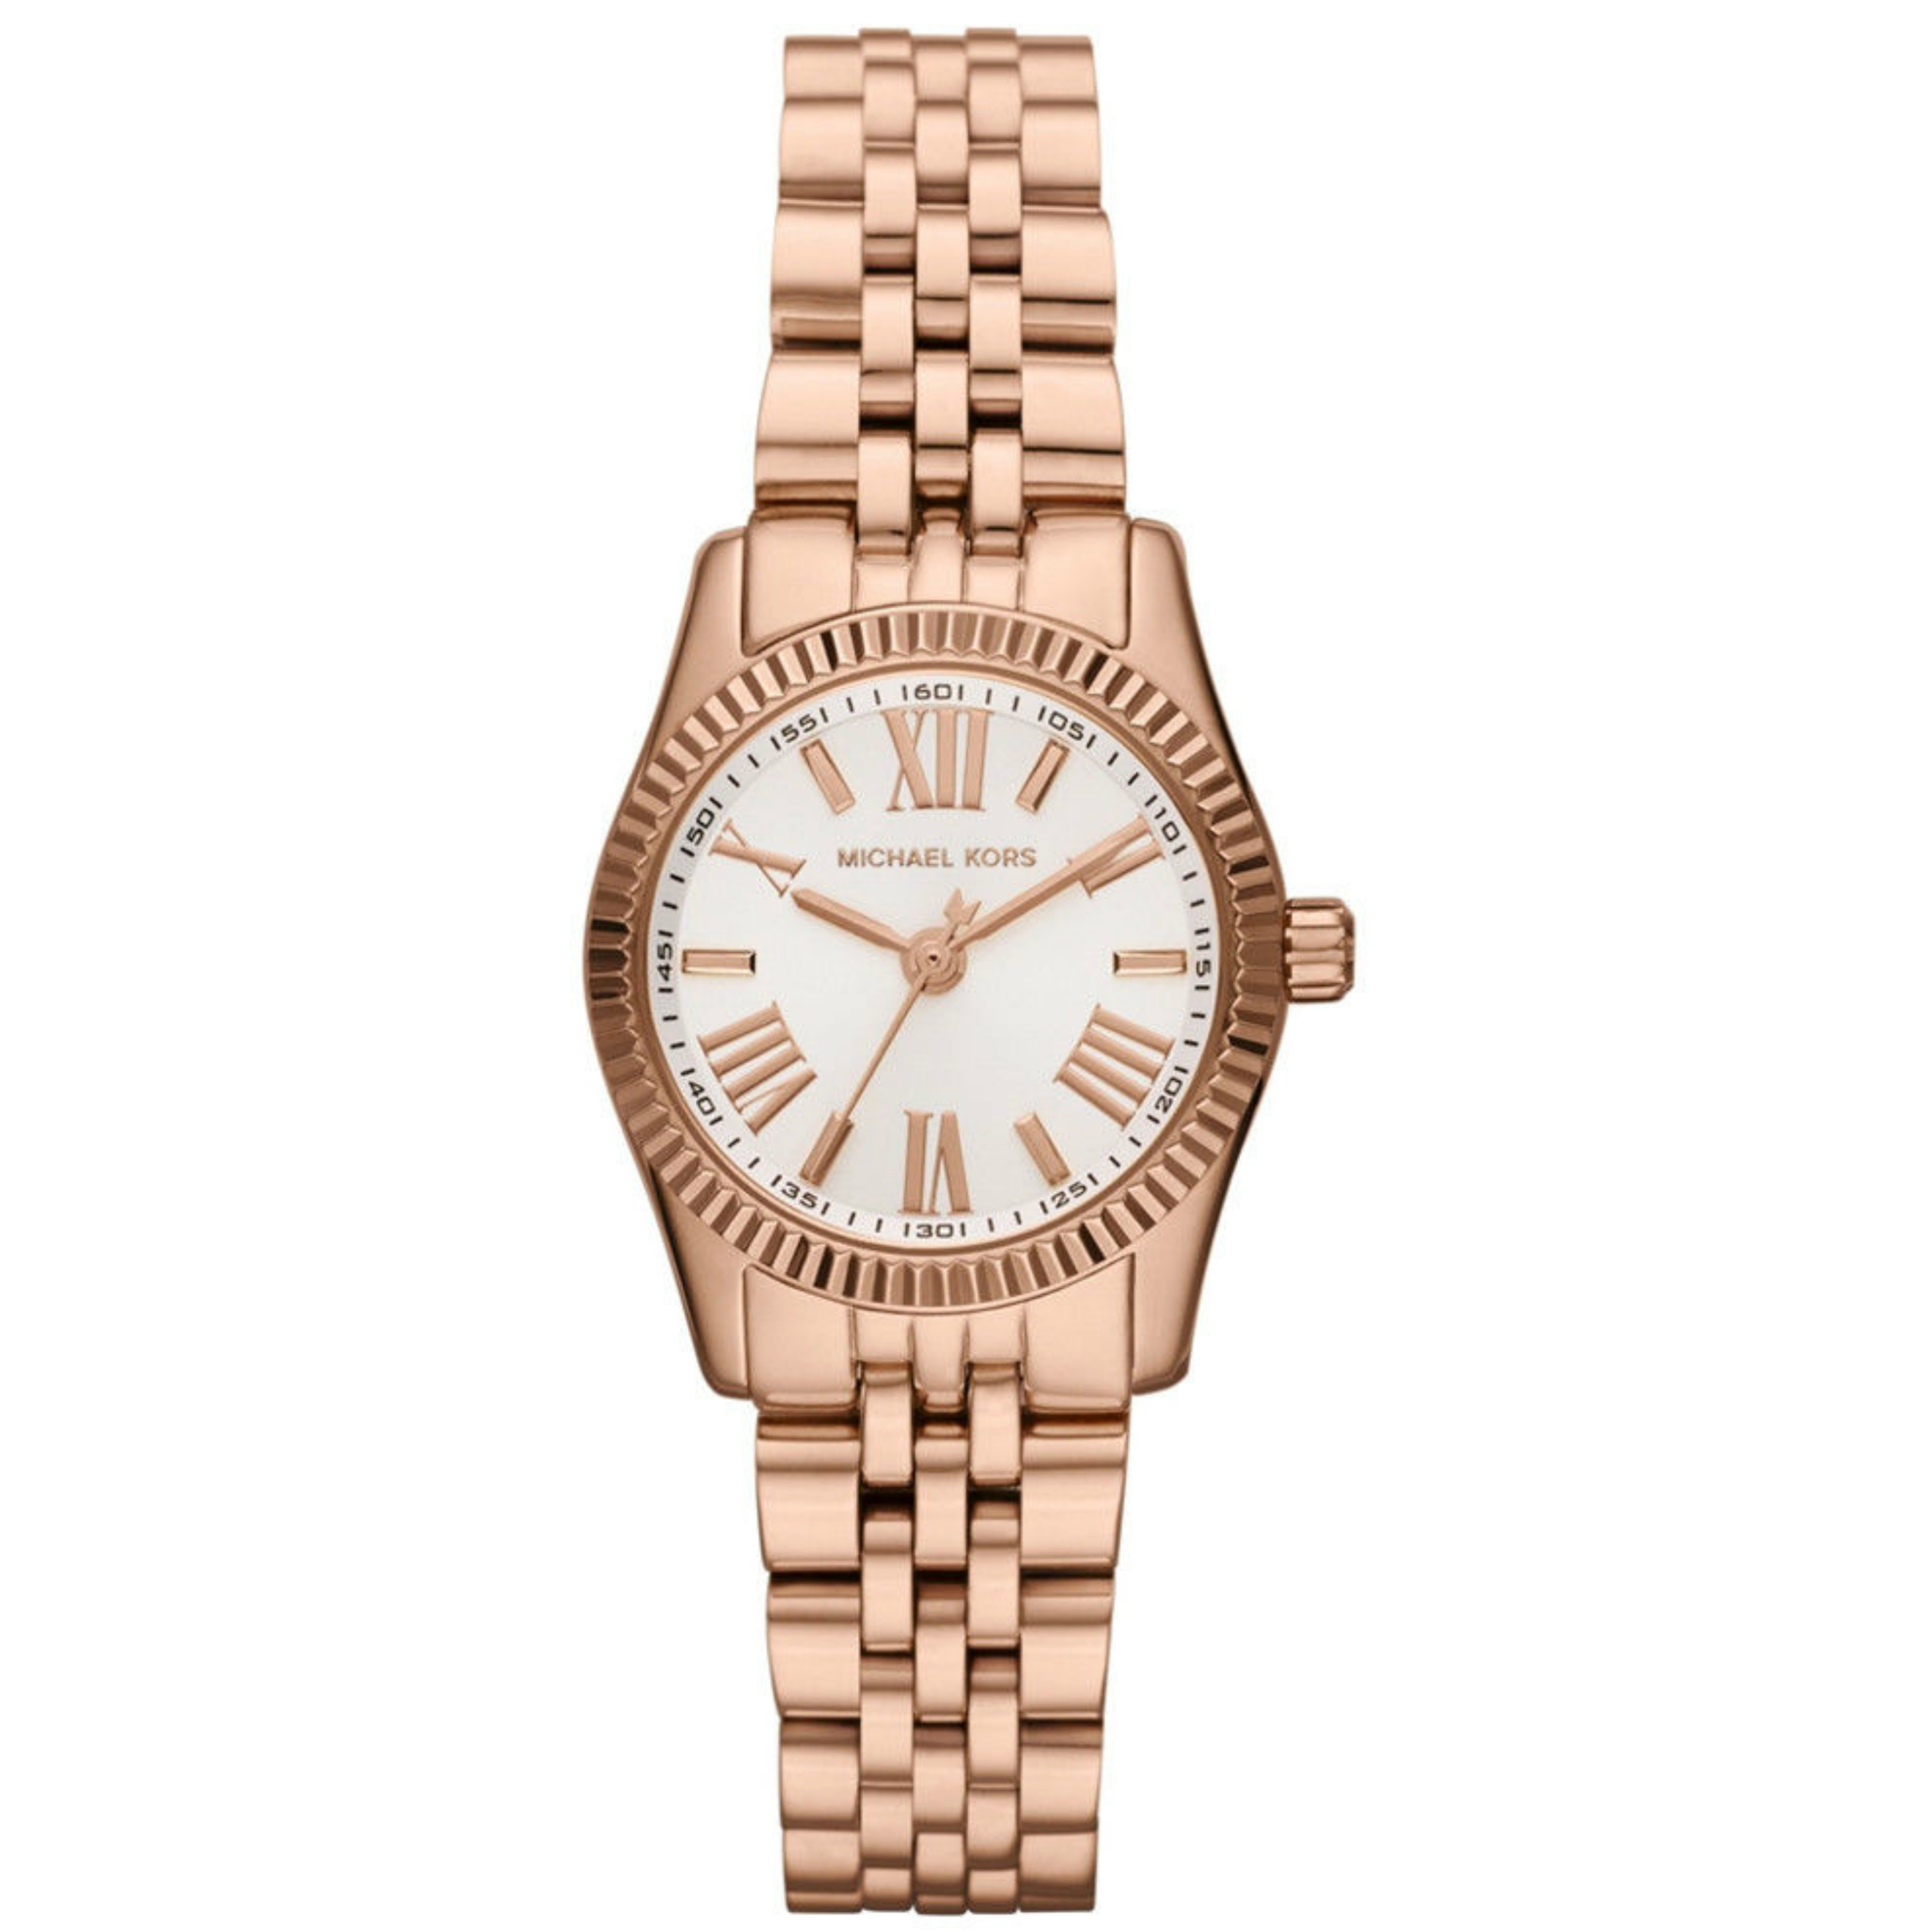 Michael Kors Lexington White Dial Rose Gold Bracelet Design Ladies Watch MK3230